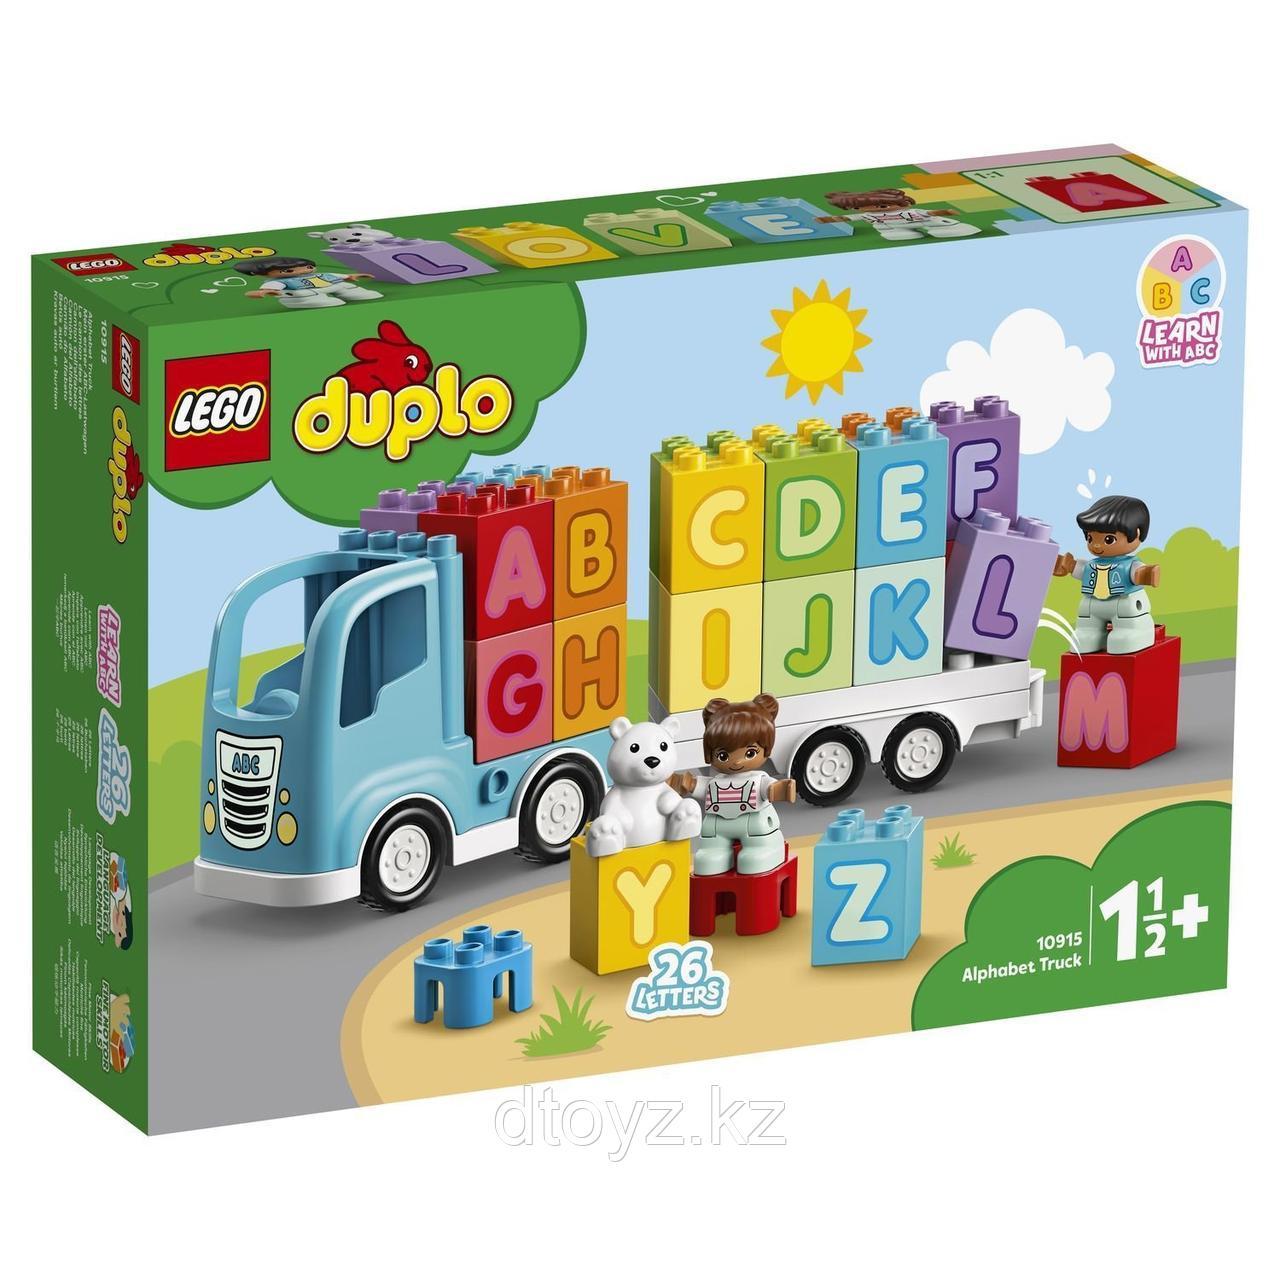 LEGO Duplo 10915 Грузовик Алфавит